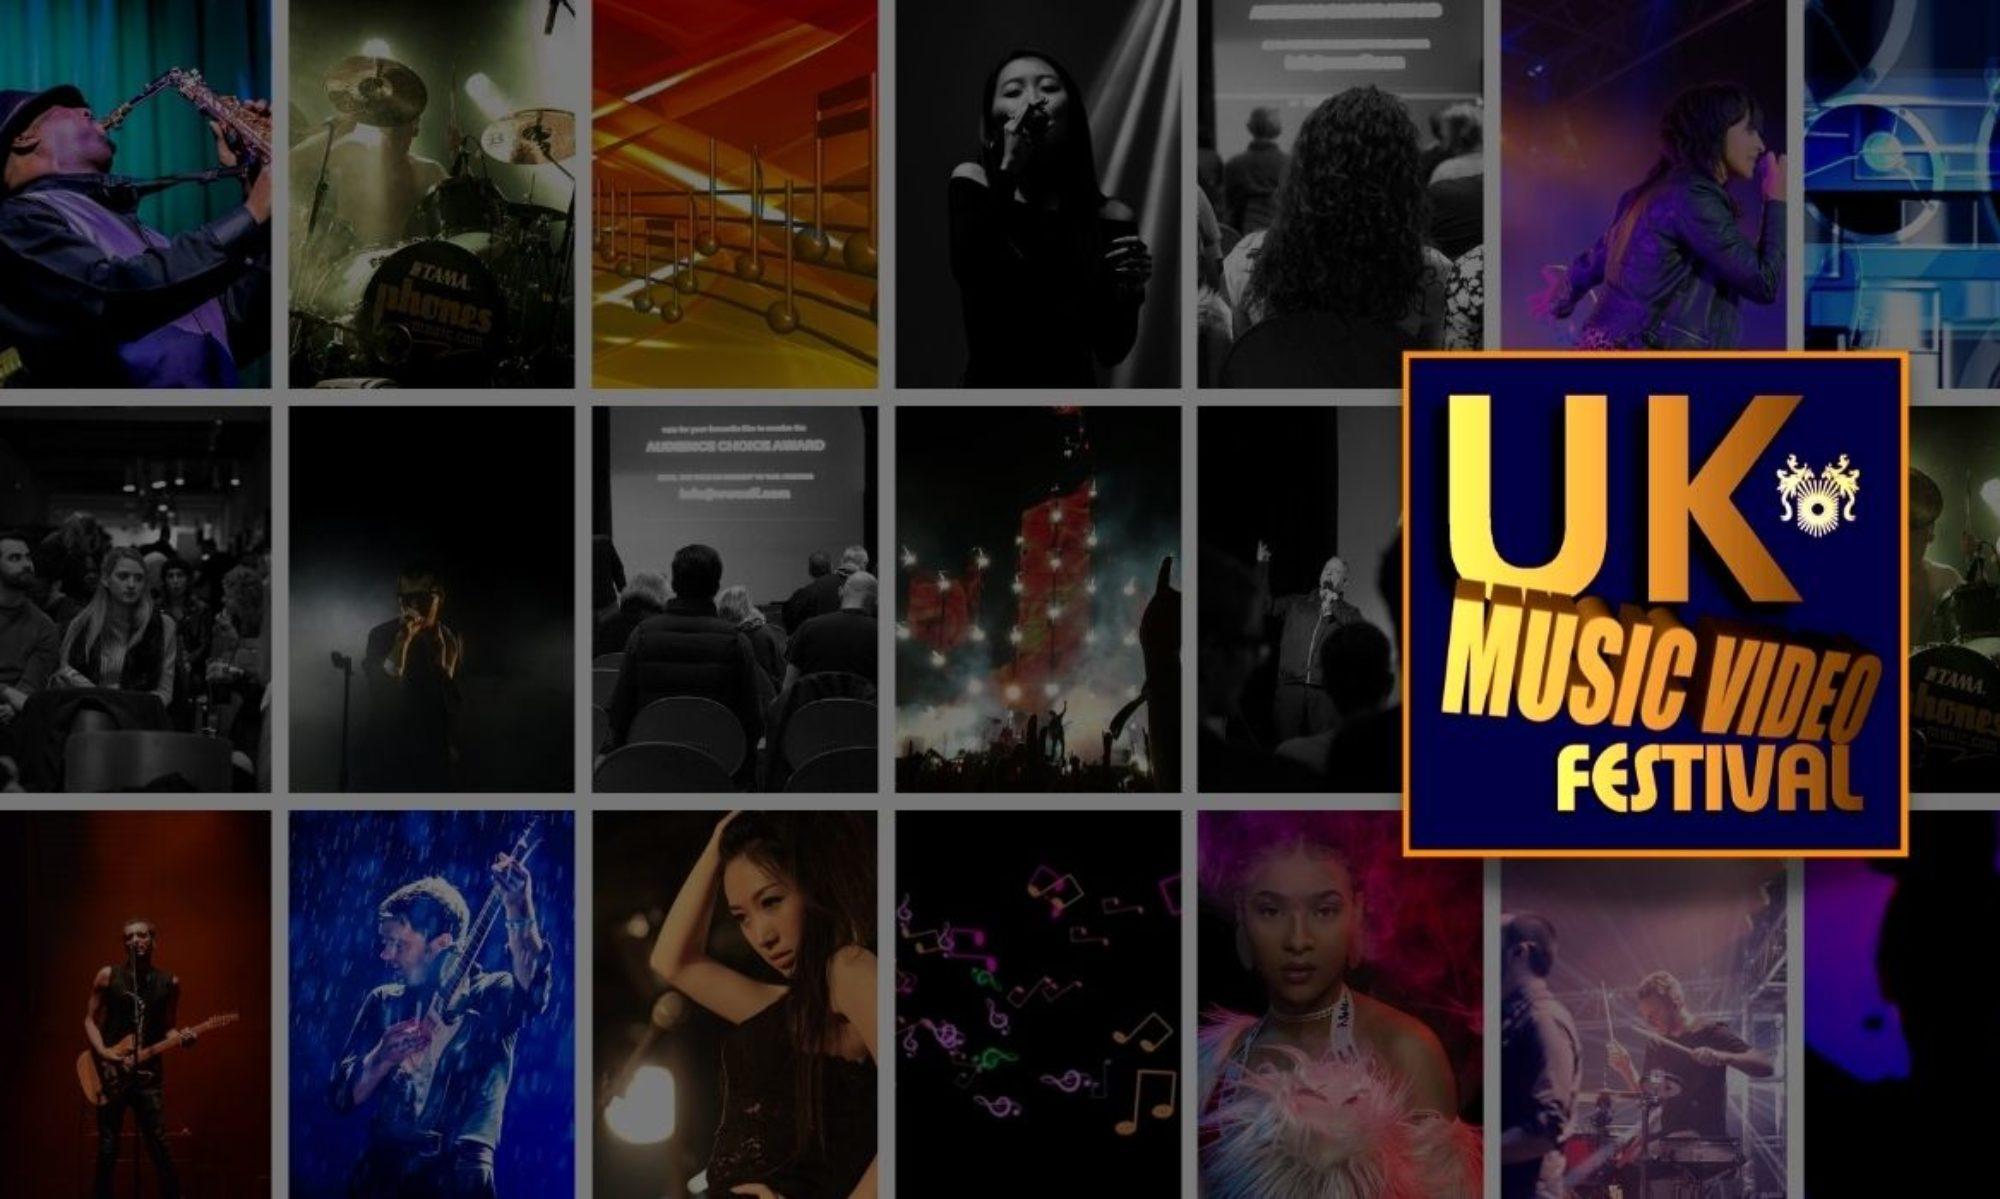 United Kingdom Music Video Festival